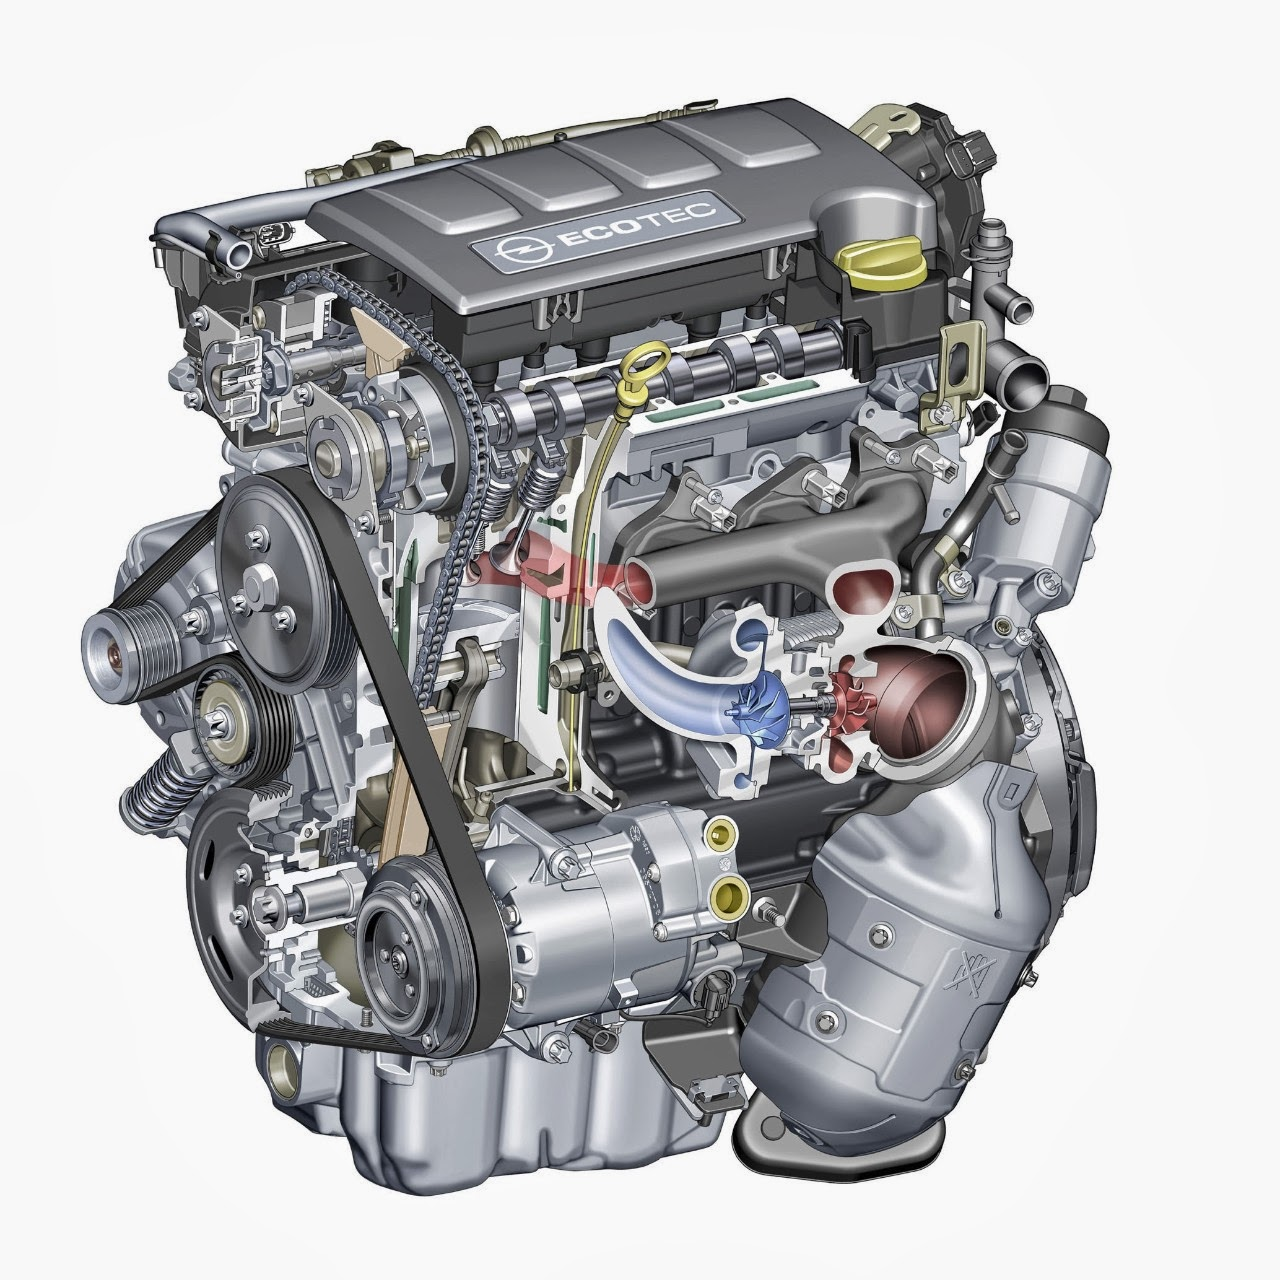 Chrysler Aspen 2009 Engine Diagram moreover 5msio Chrysler 300m Hi Tom I Helped One Customers further RepairGuideContent likewise 25 001 06 together with Chrysler 2 7l V6 Engine. on 2007 chrysler sebring evap system